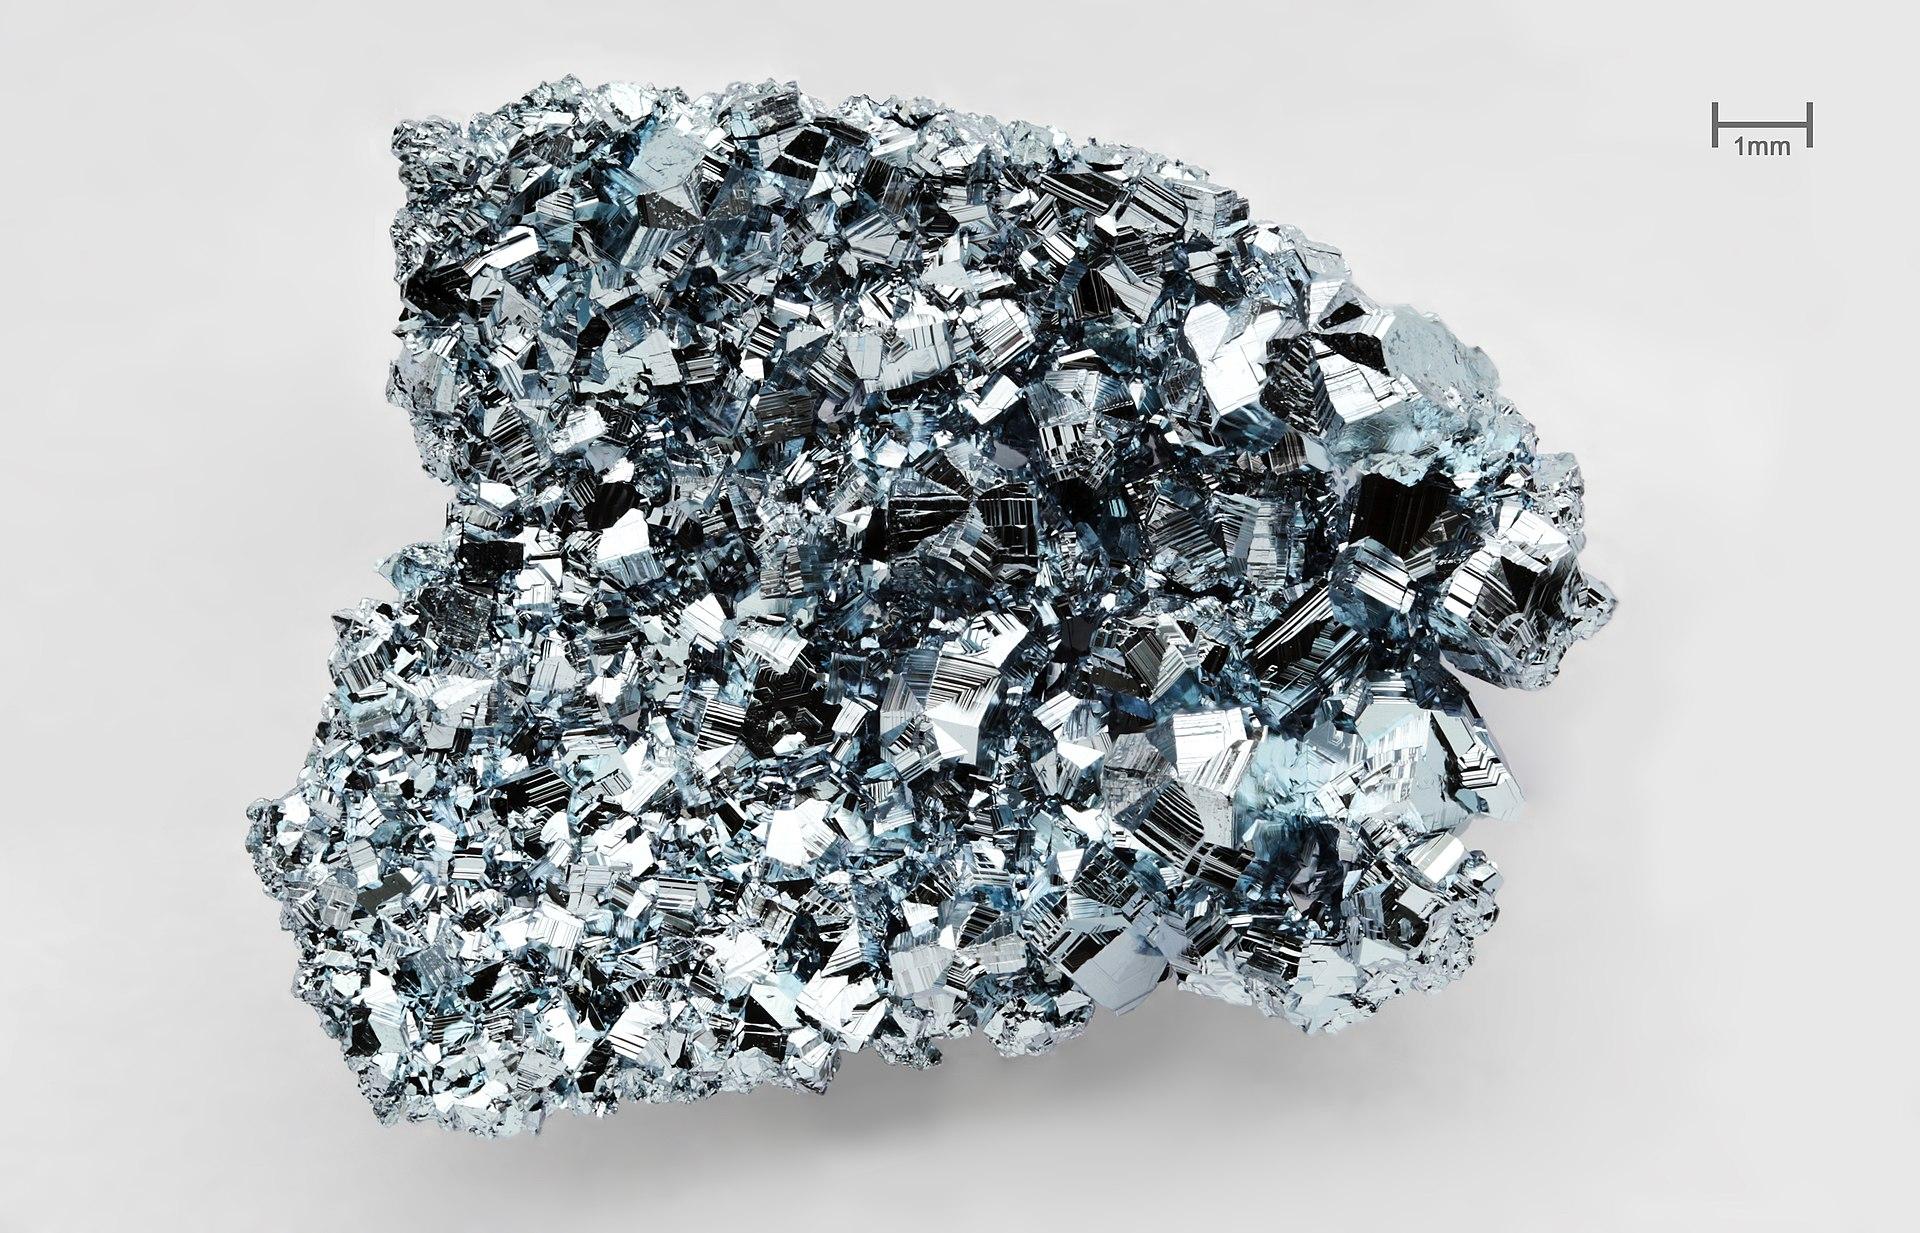 Osmium - Wikipedia